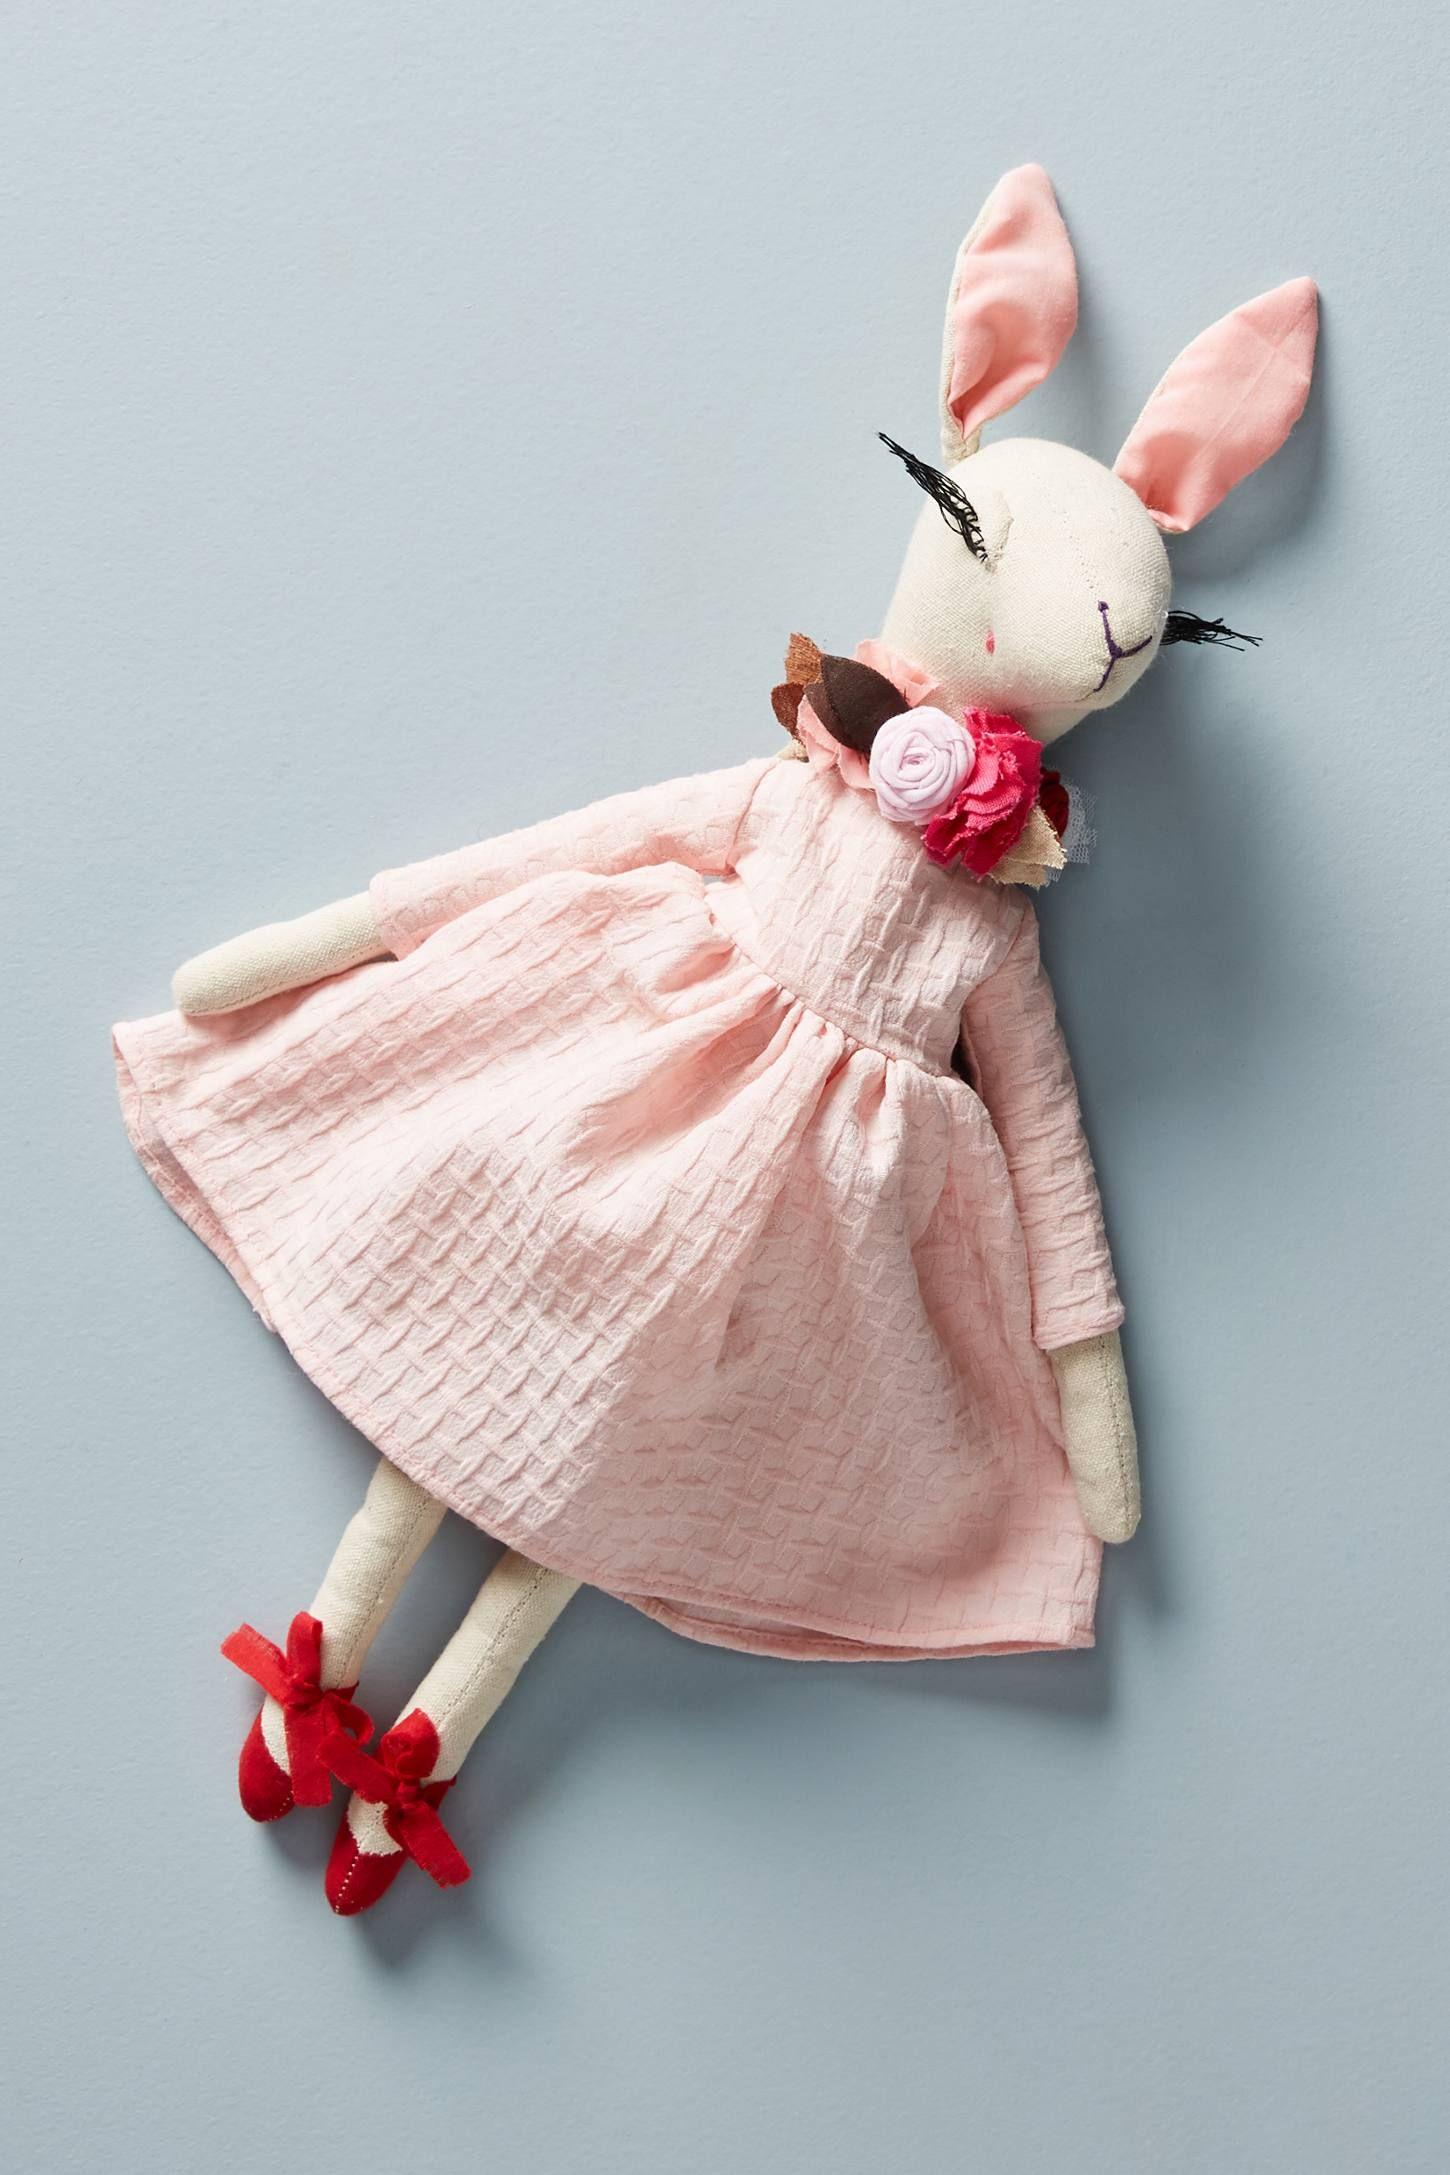 Lena Bekh Victoria Stuffed Animal | Flamingo stuffed ...